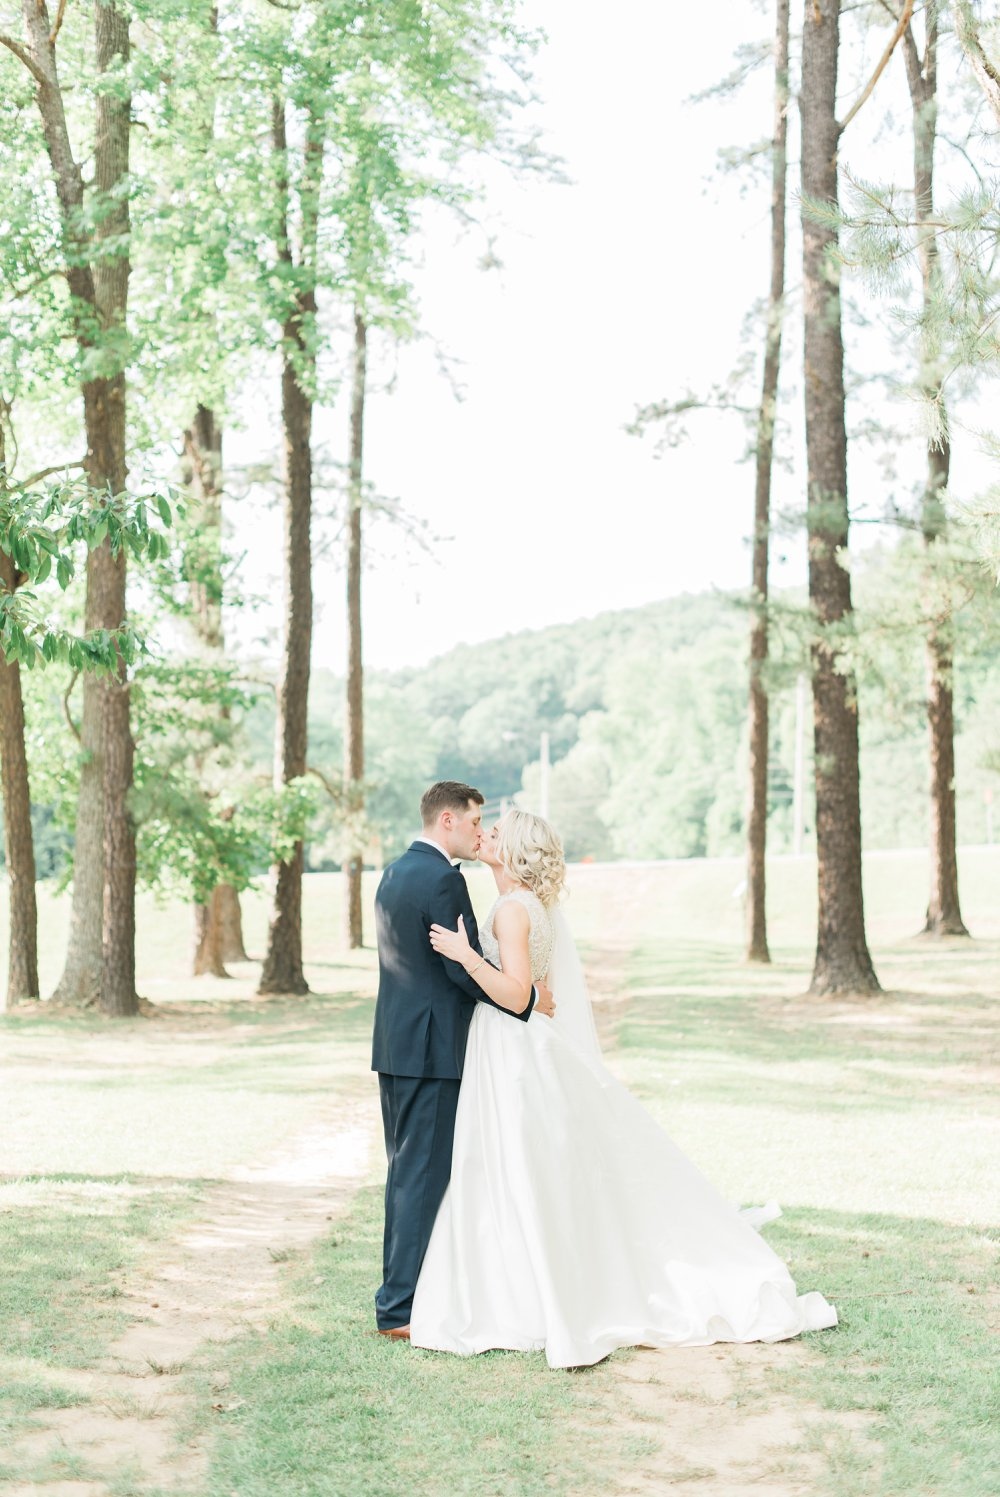 shawnee-lodge-state-park-wedding-portsmouth-ohio_0087.jpg